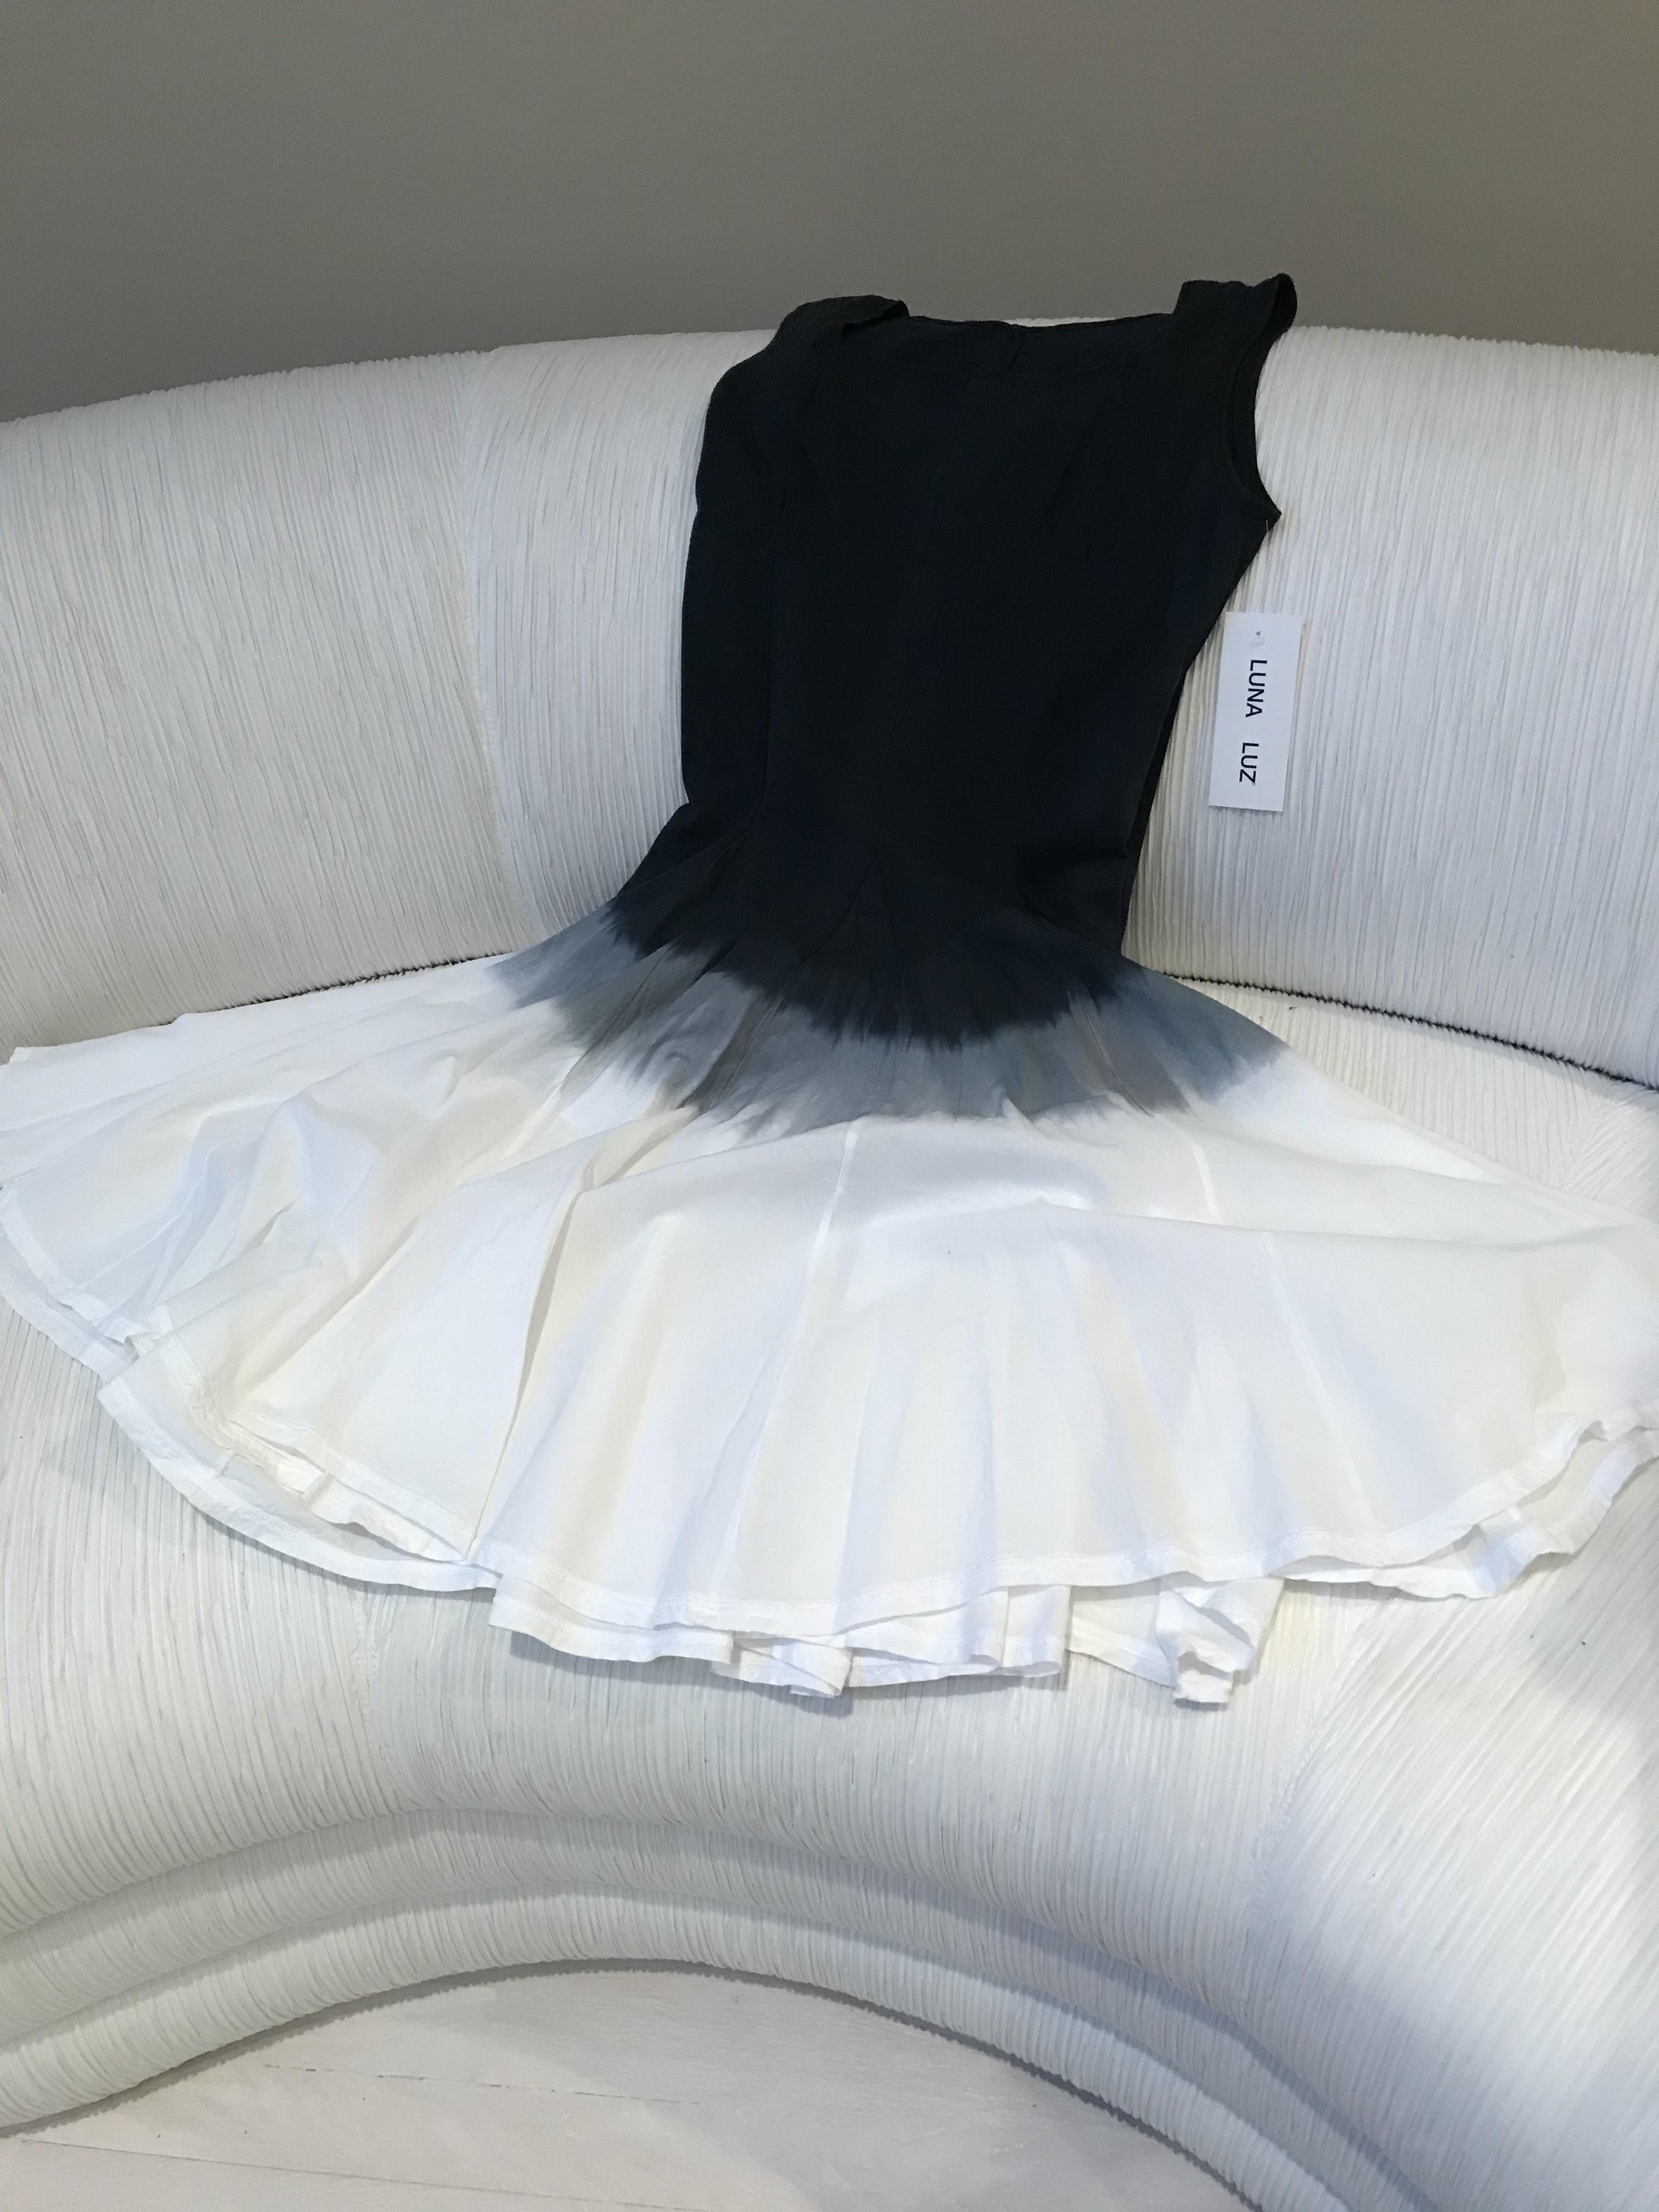 Luna Luz: Square Neck Godet Dyed Tank Dress SOLD OUT